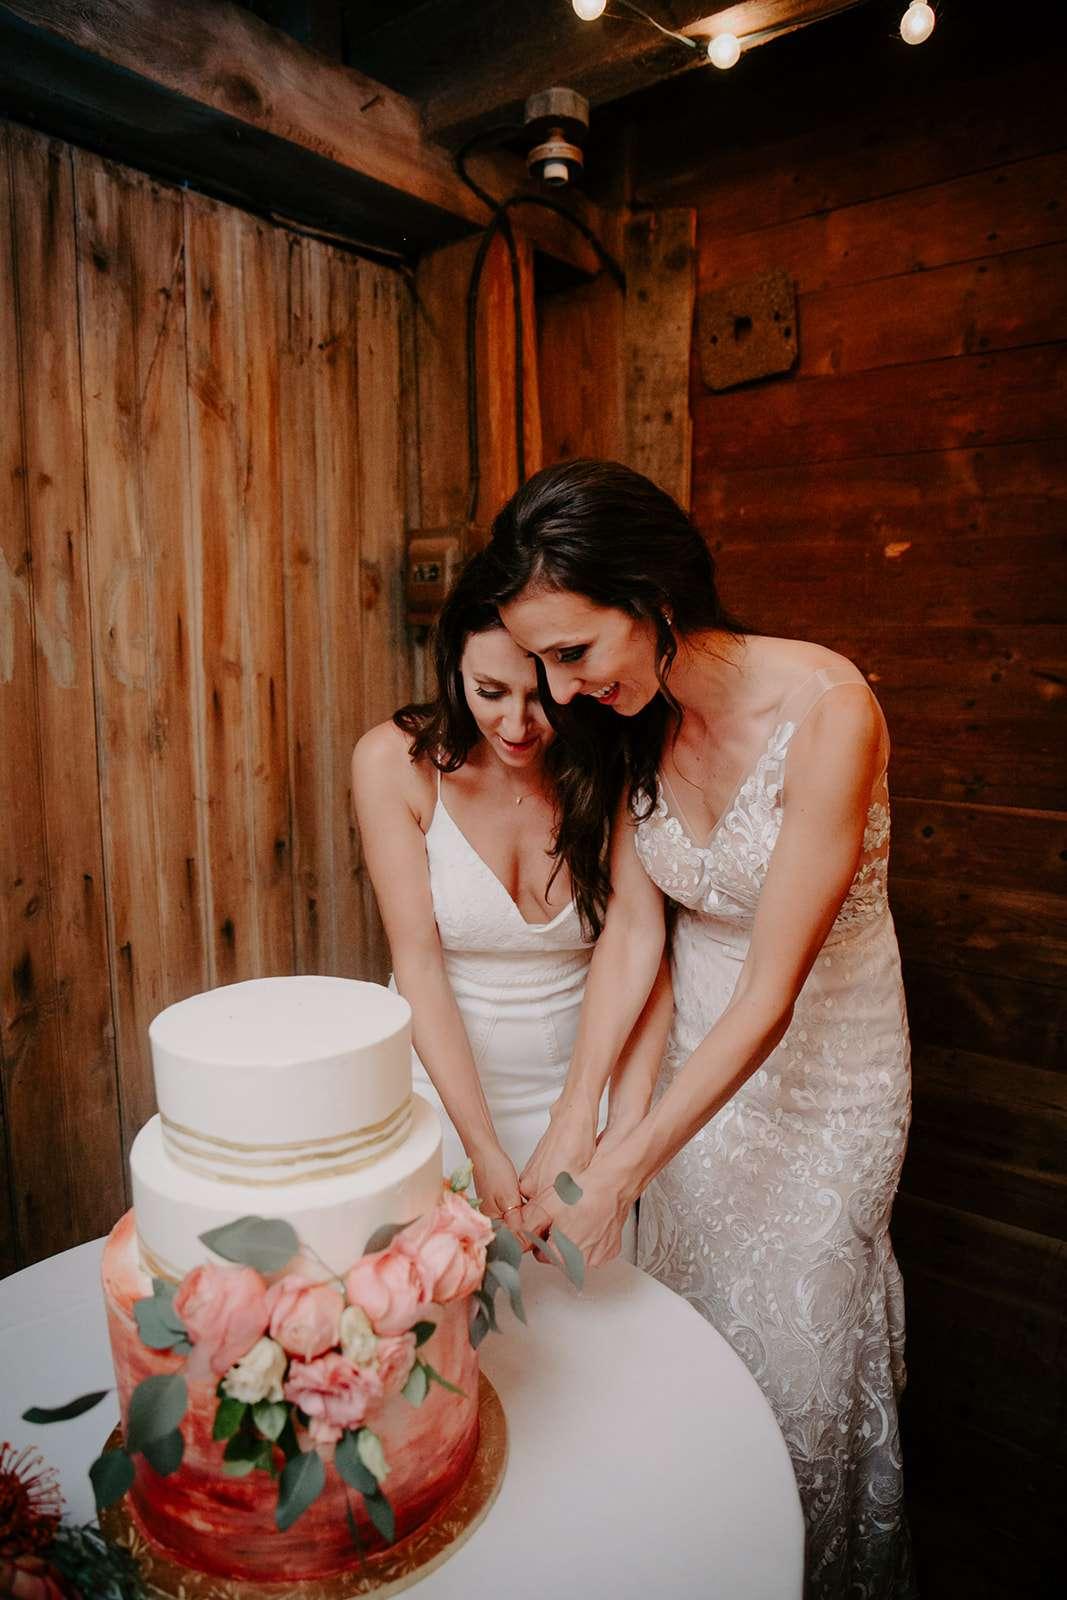 Two brides cutting their wedding cake.